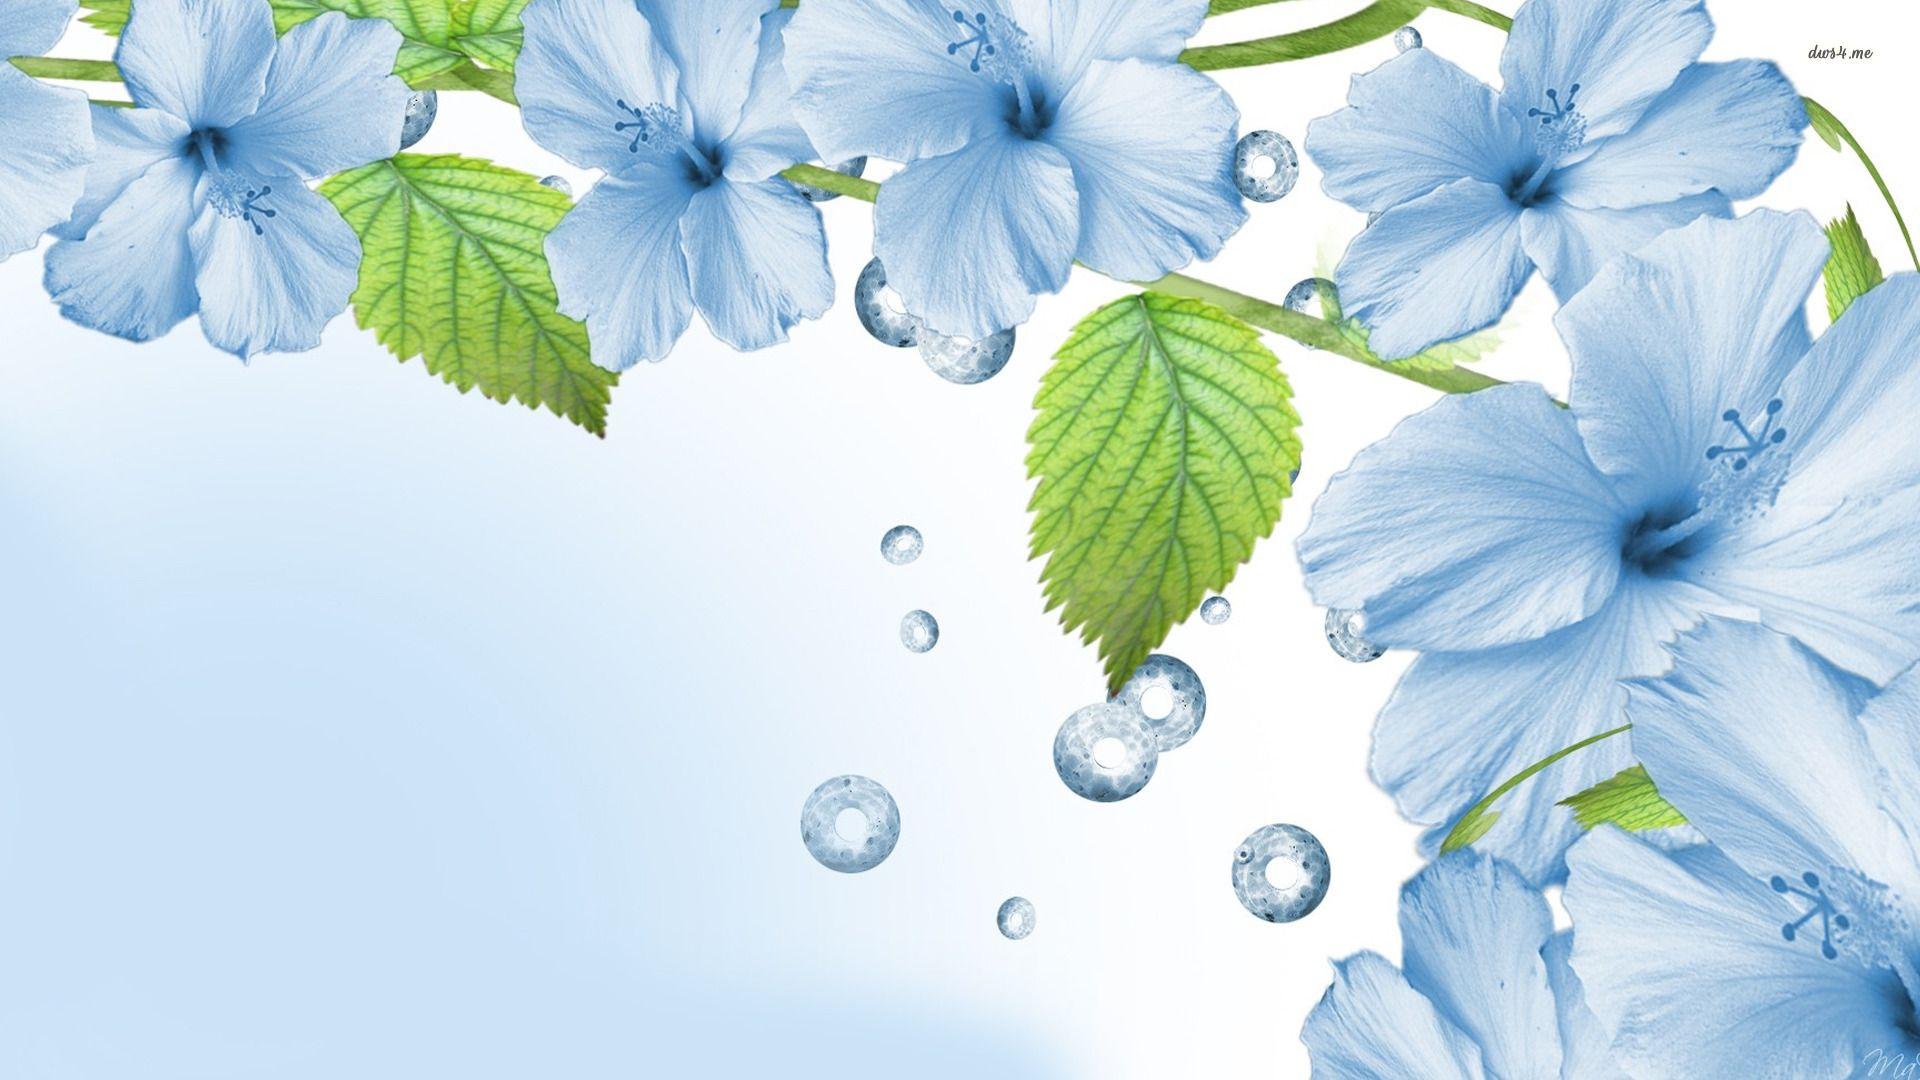 Blue Flowers Wallpaper HD Wallpapers Pinterest